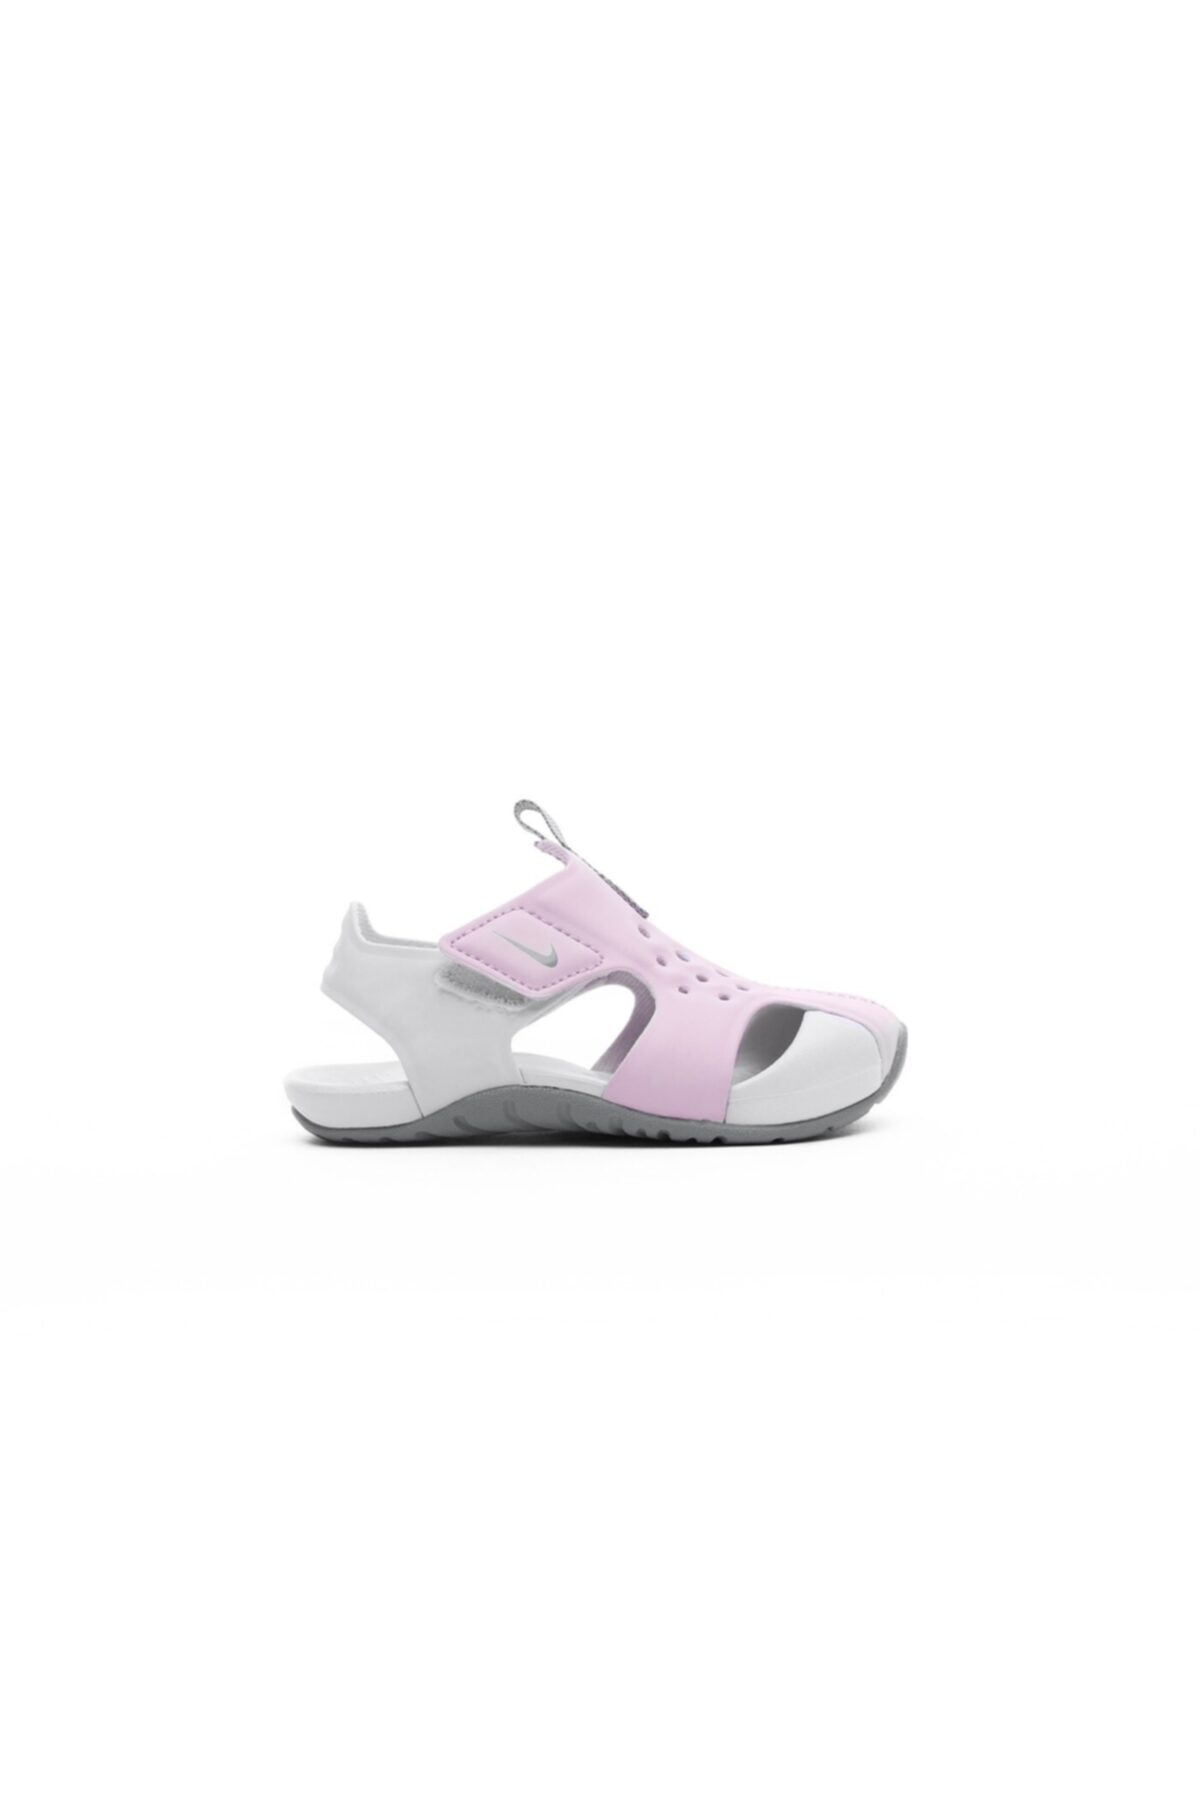 Nike Bebek Sandalet 1